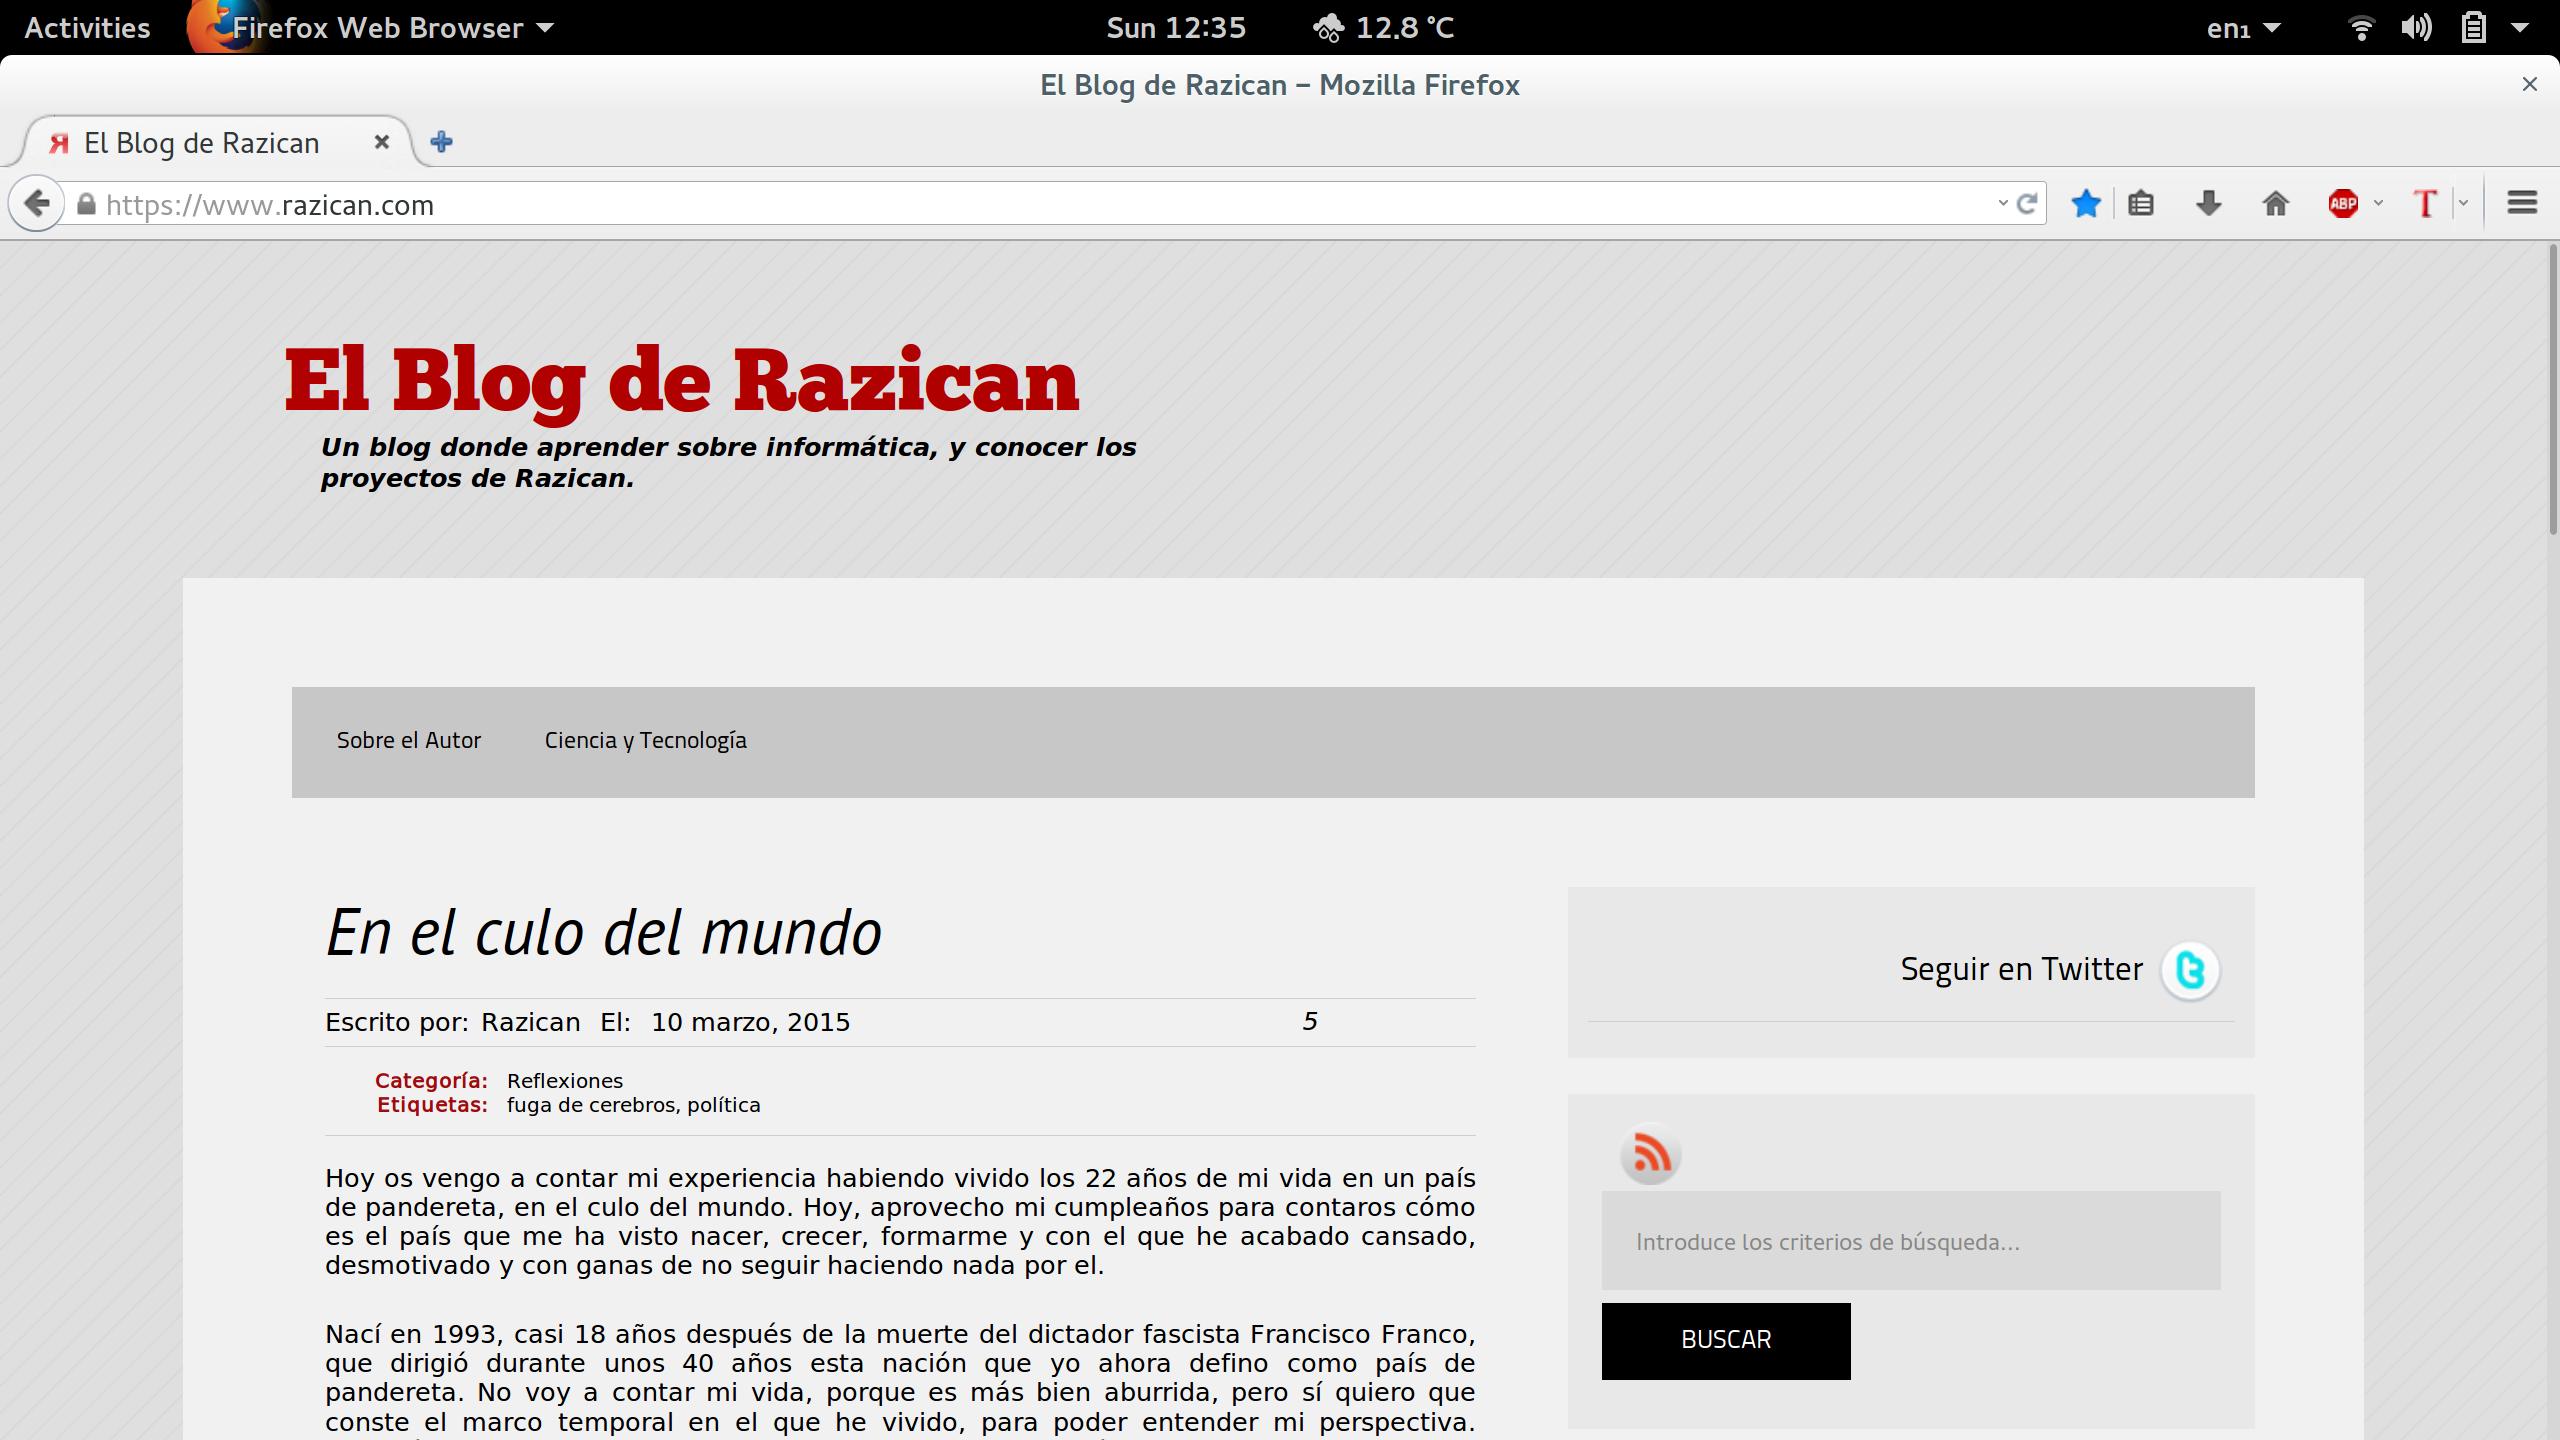 El Blog de Razican en HiDPI